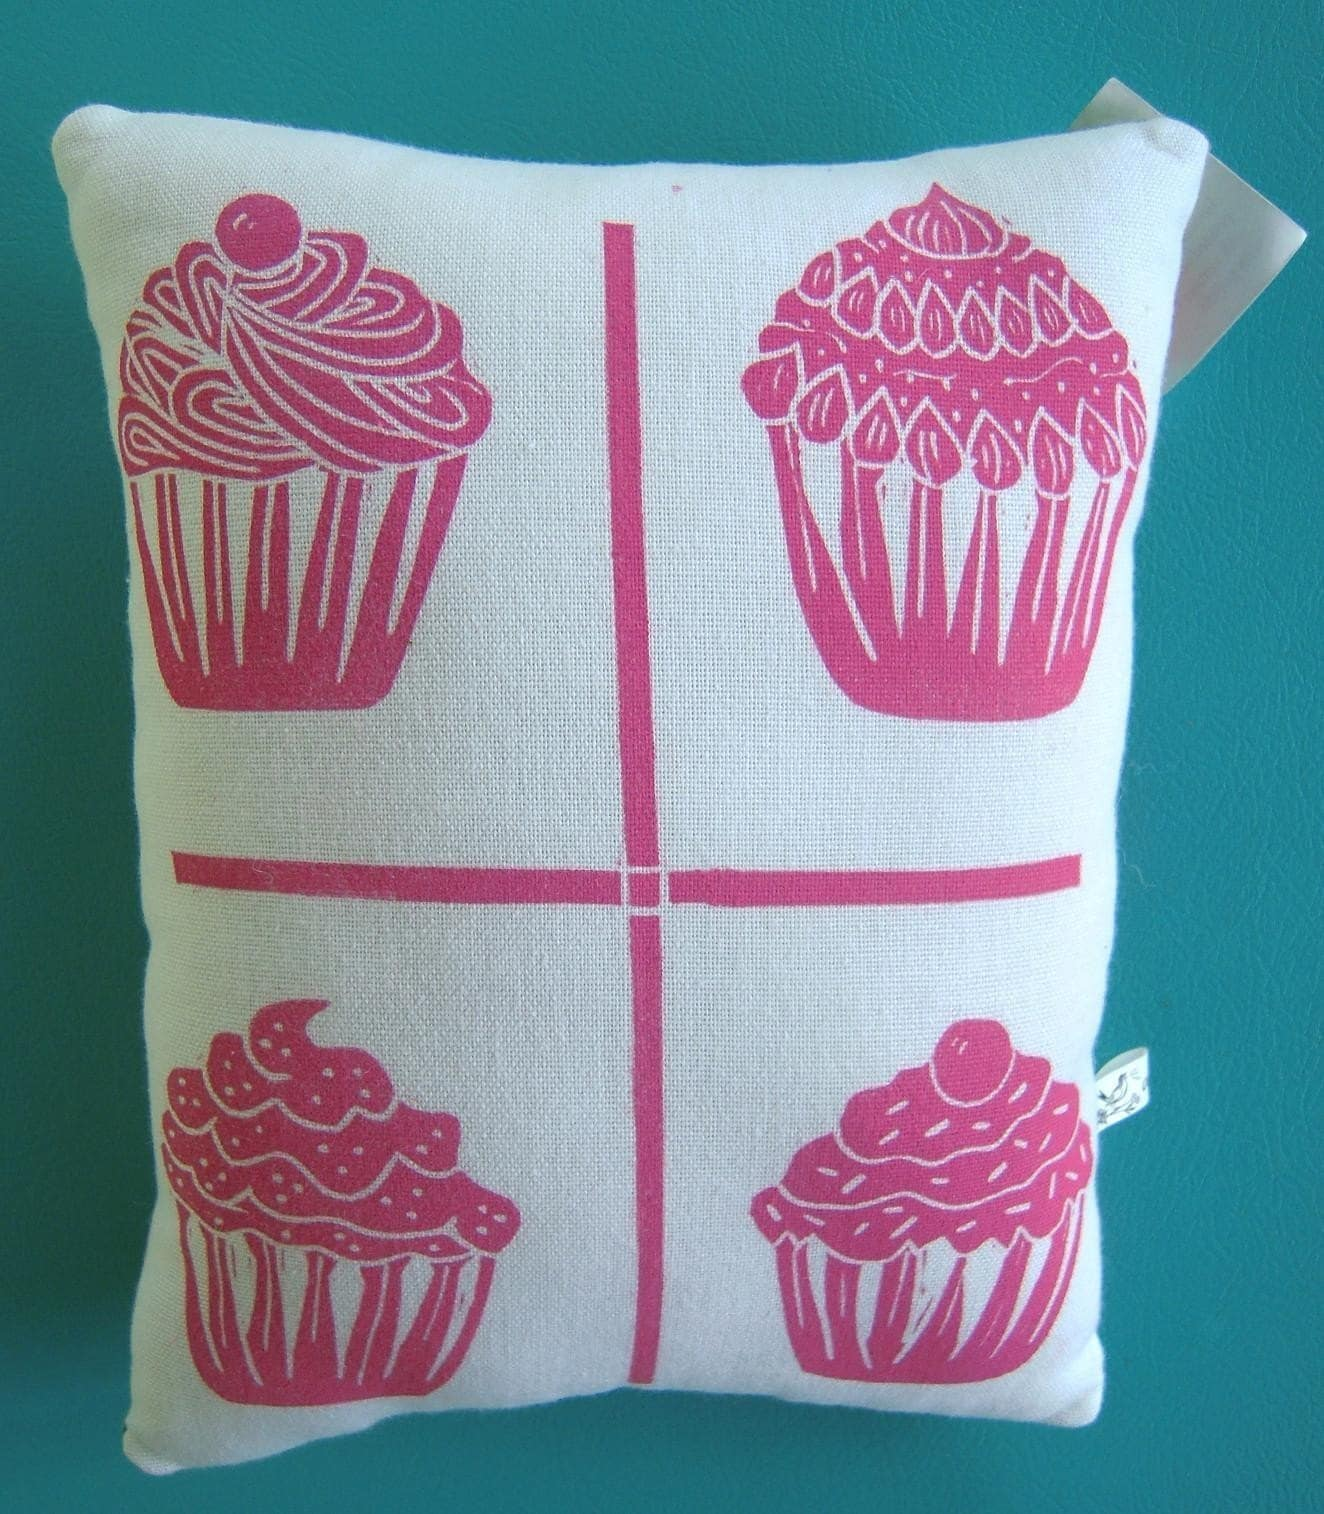 NEW block print mini cupcake accent pillow